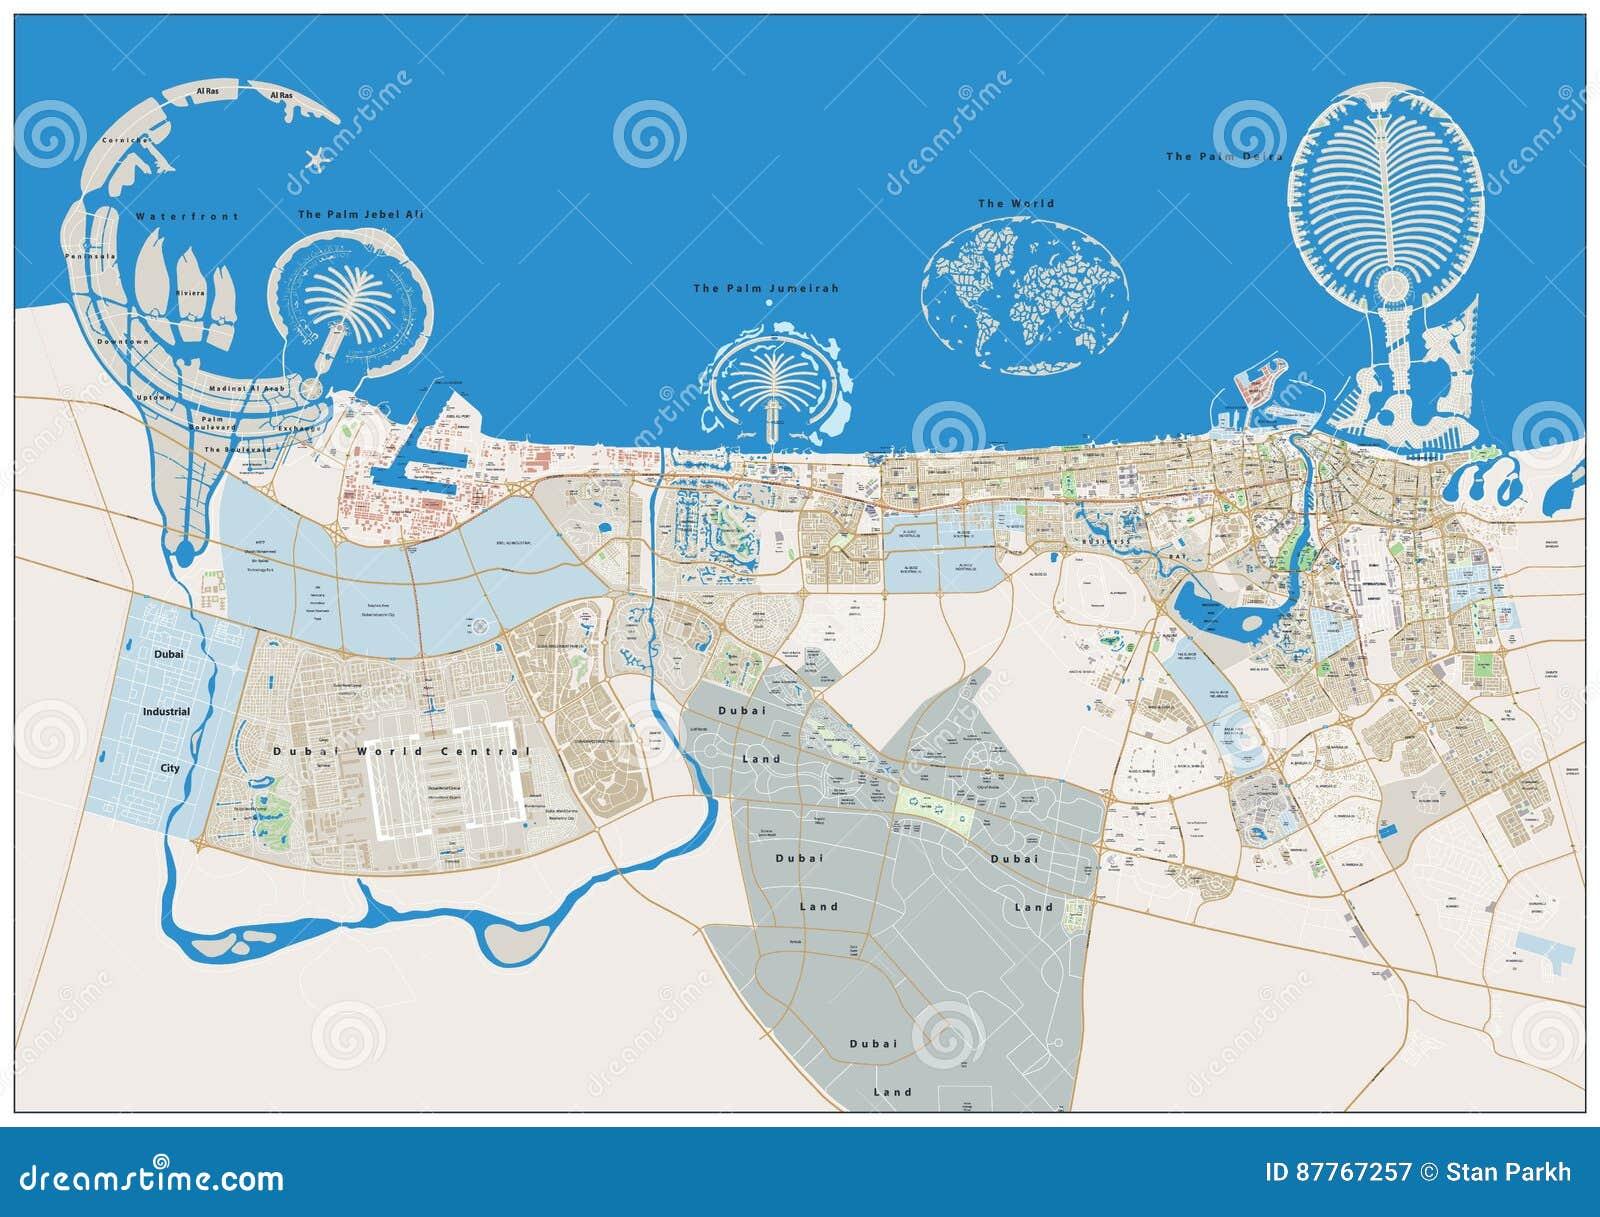 Dubaj Ogromnego Miasta Mapa Ilustracja Wektor Ilustracja